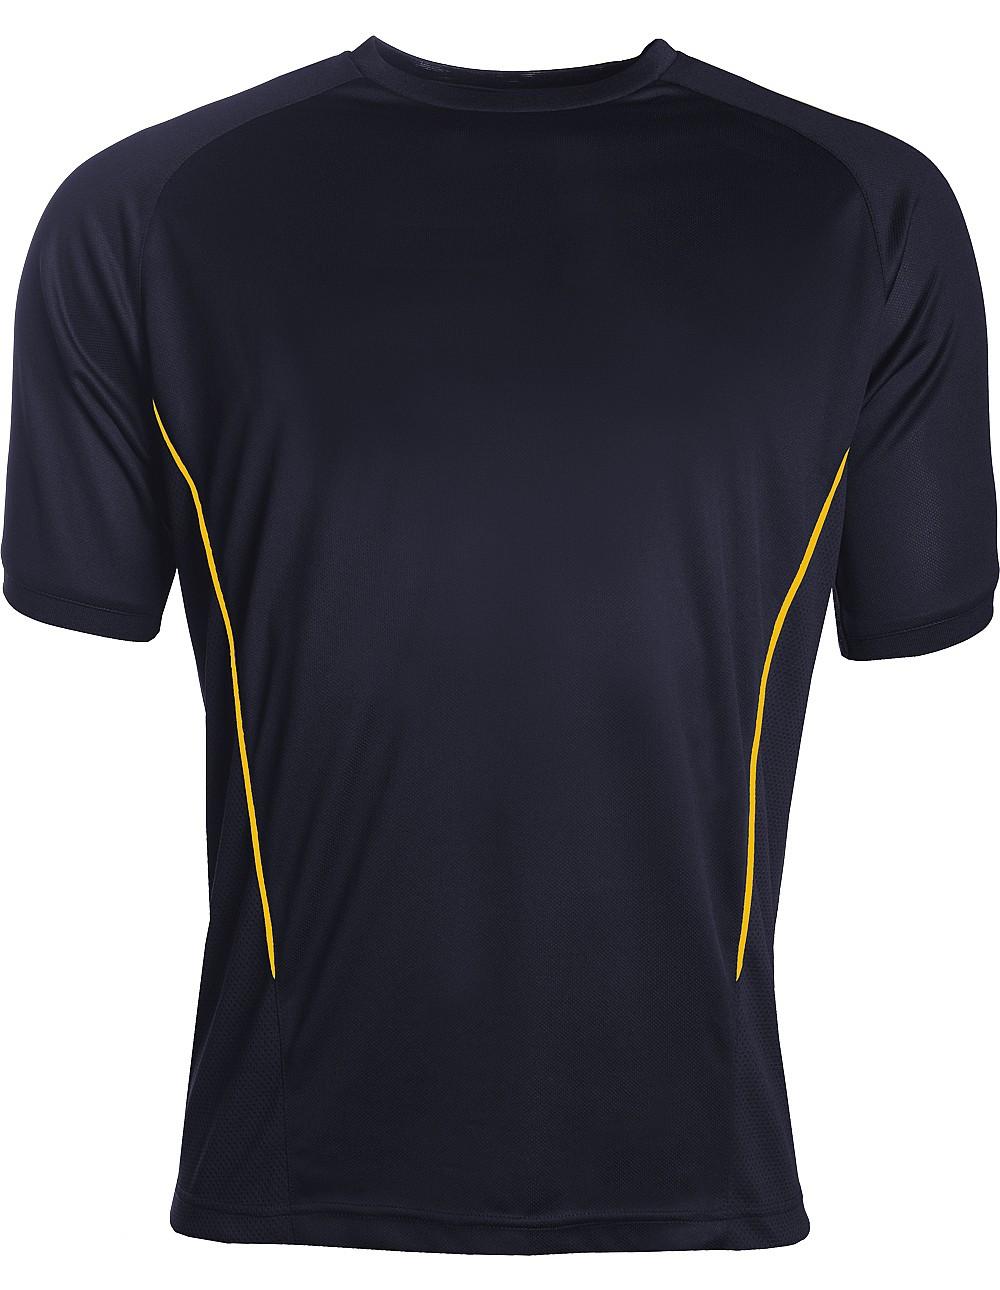 Aptus training top navy/gold